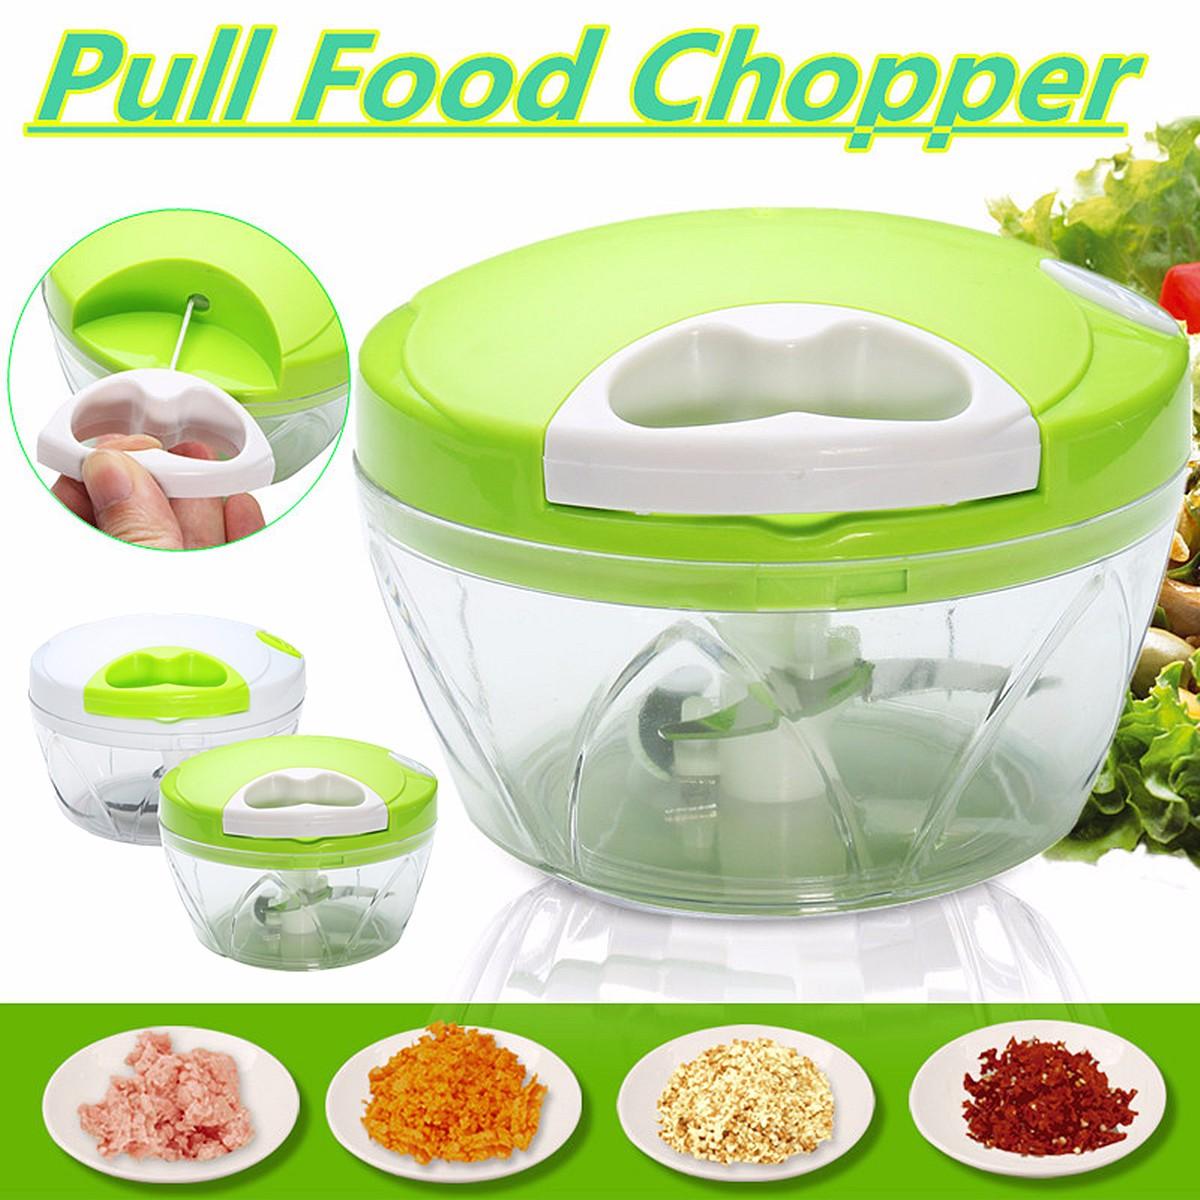 Manual Meat Grinder Vegetable Chopper Cutter Processor Chopper Twist Shredder SZ